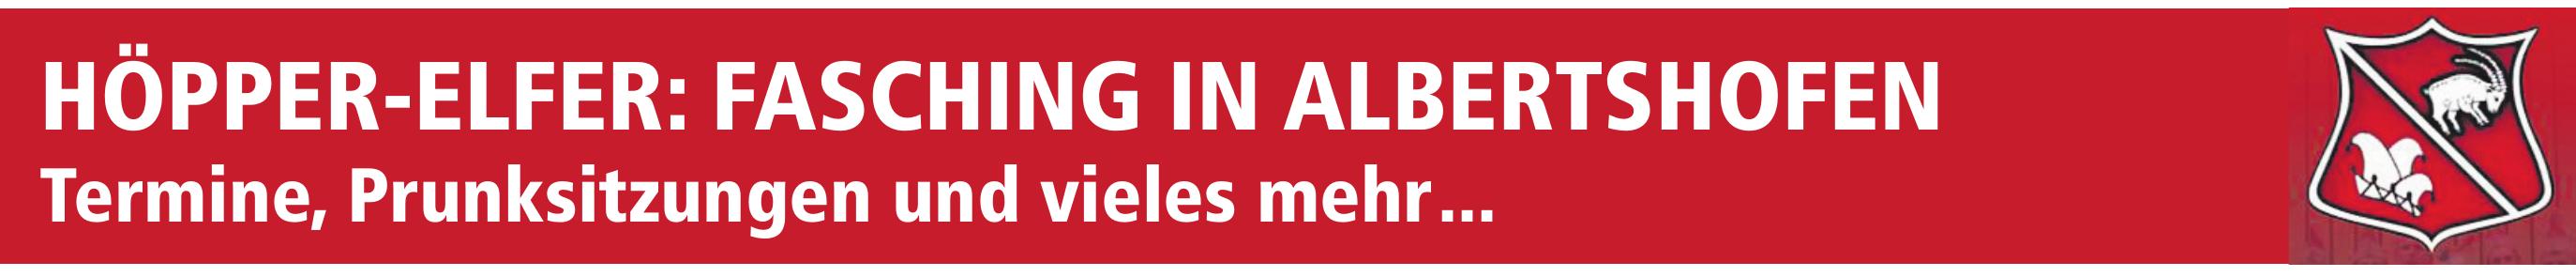 Höpper-Elfer: Fasching in Albertshofen Image 1